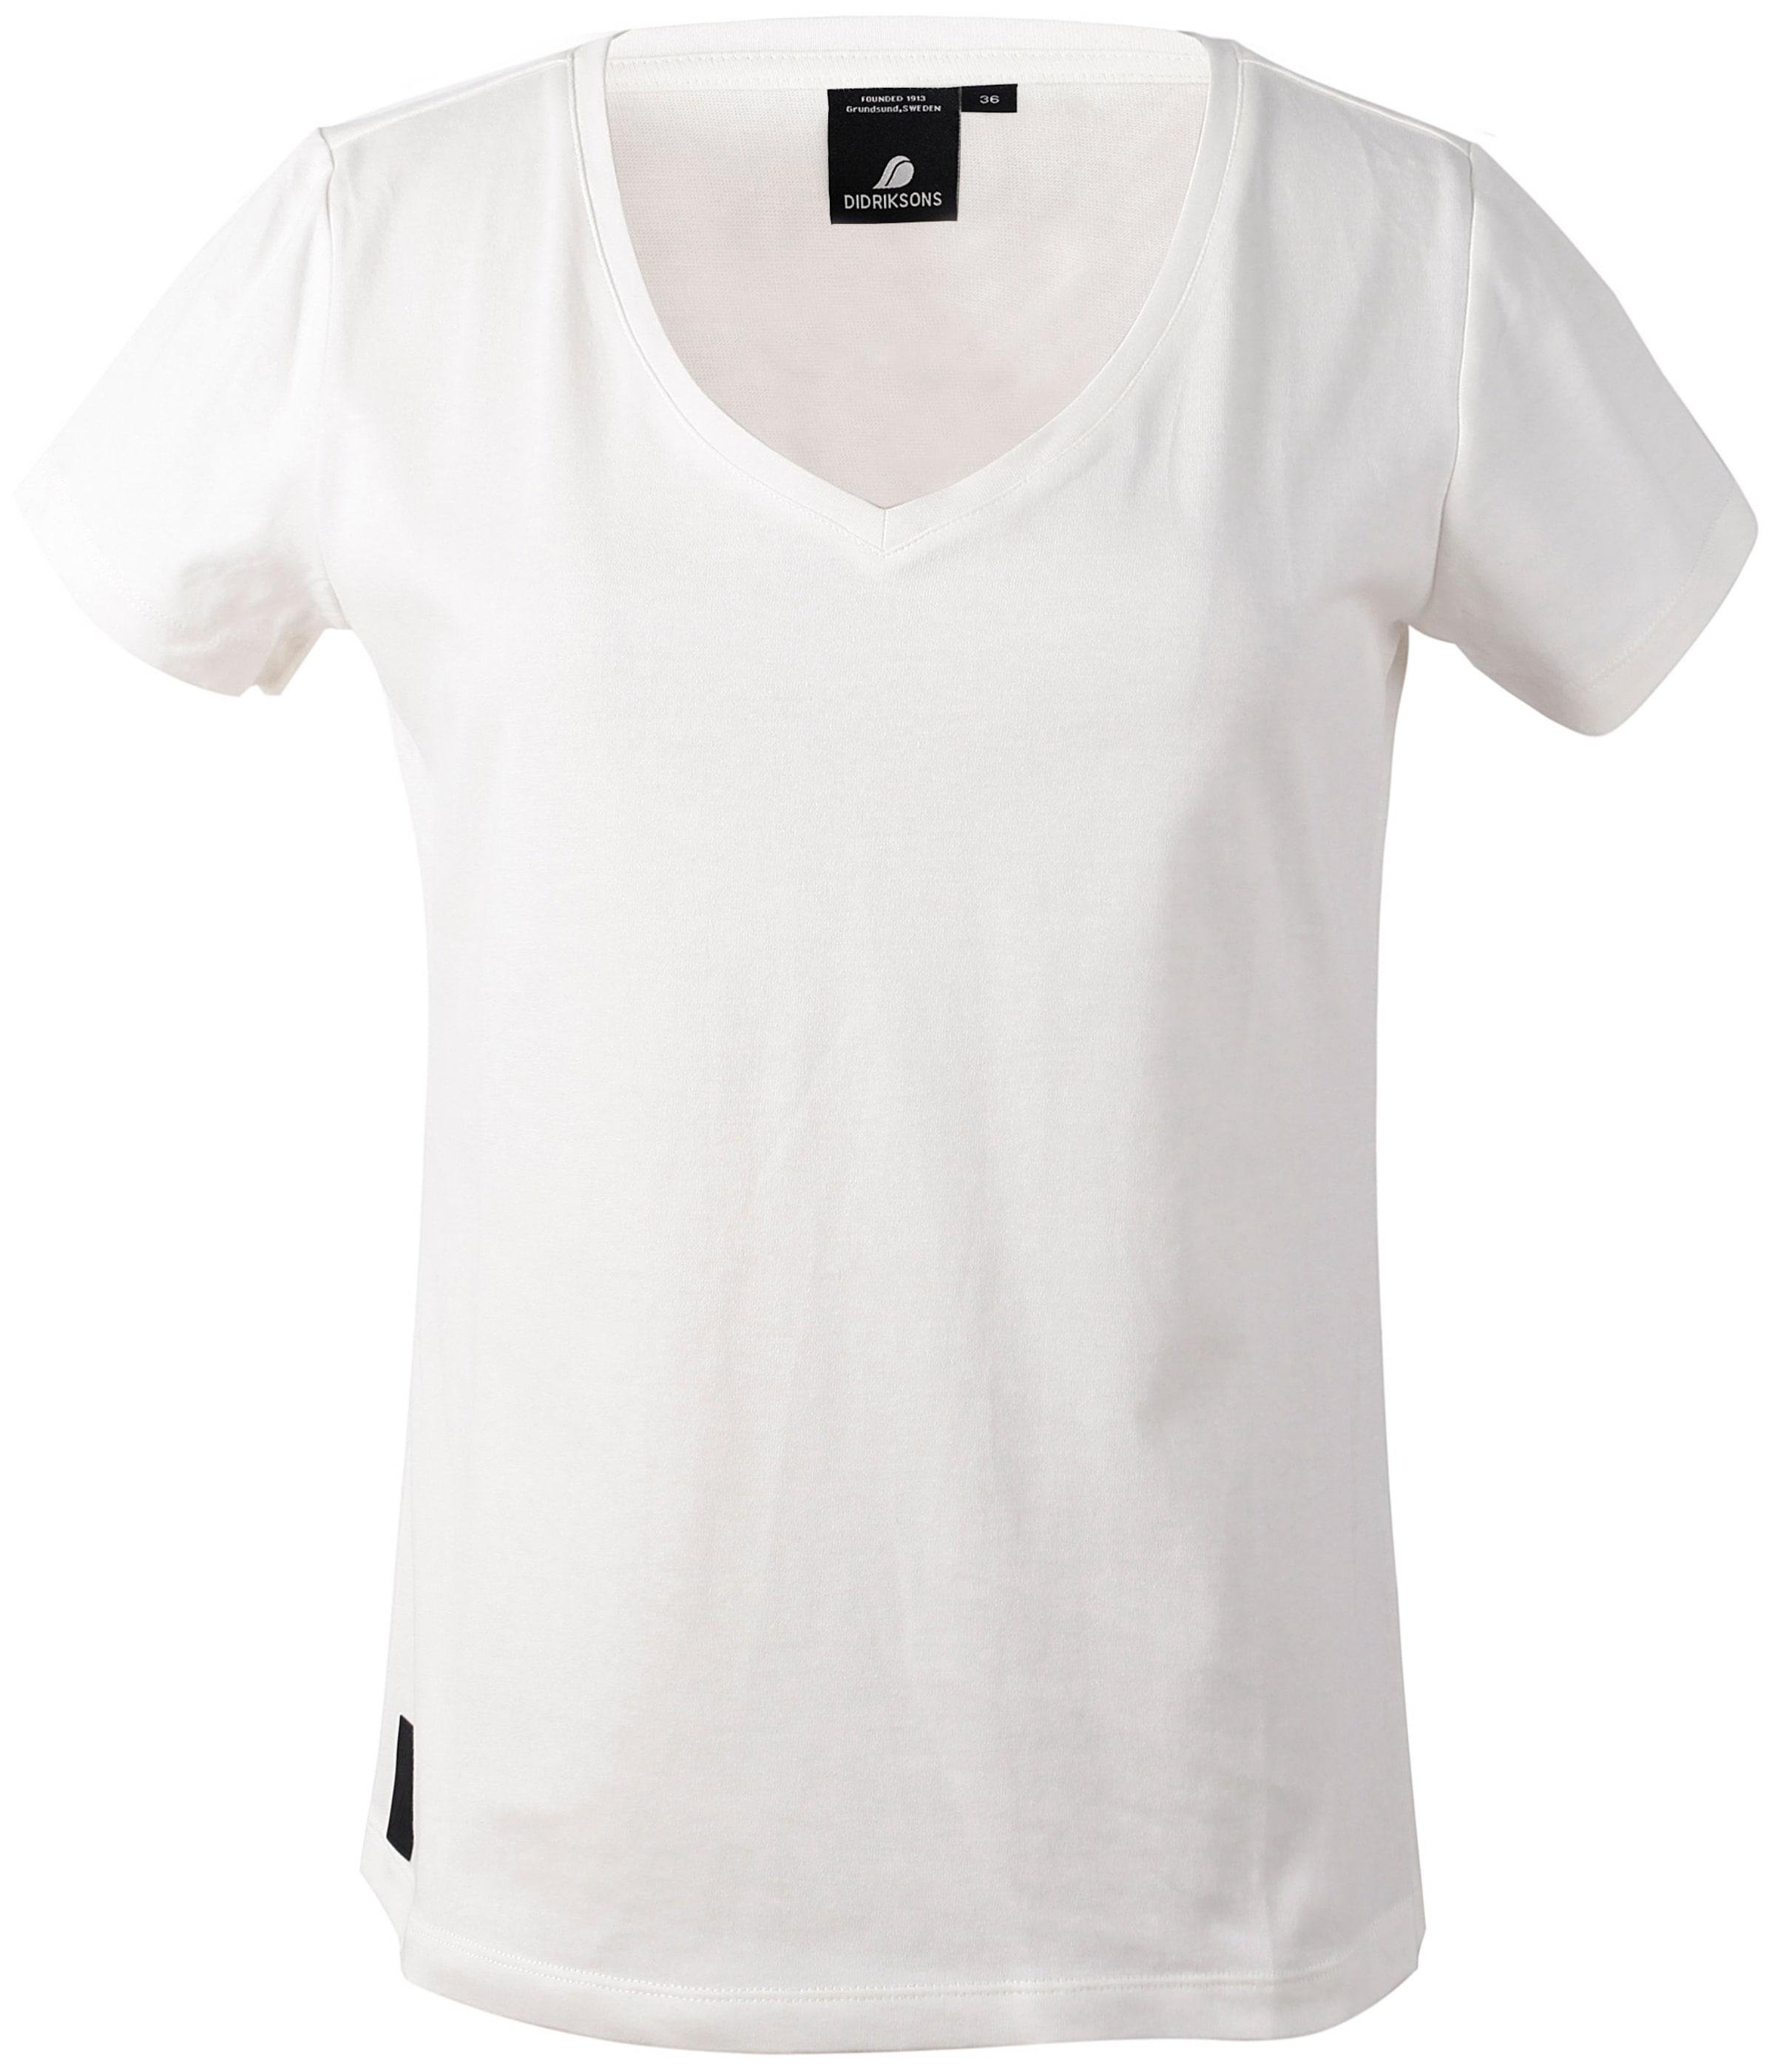 shirt Didriksons1913 Weiß 'ebba' T In bgY6yf7v